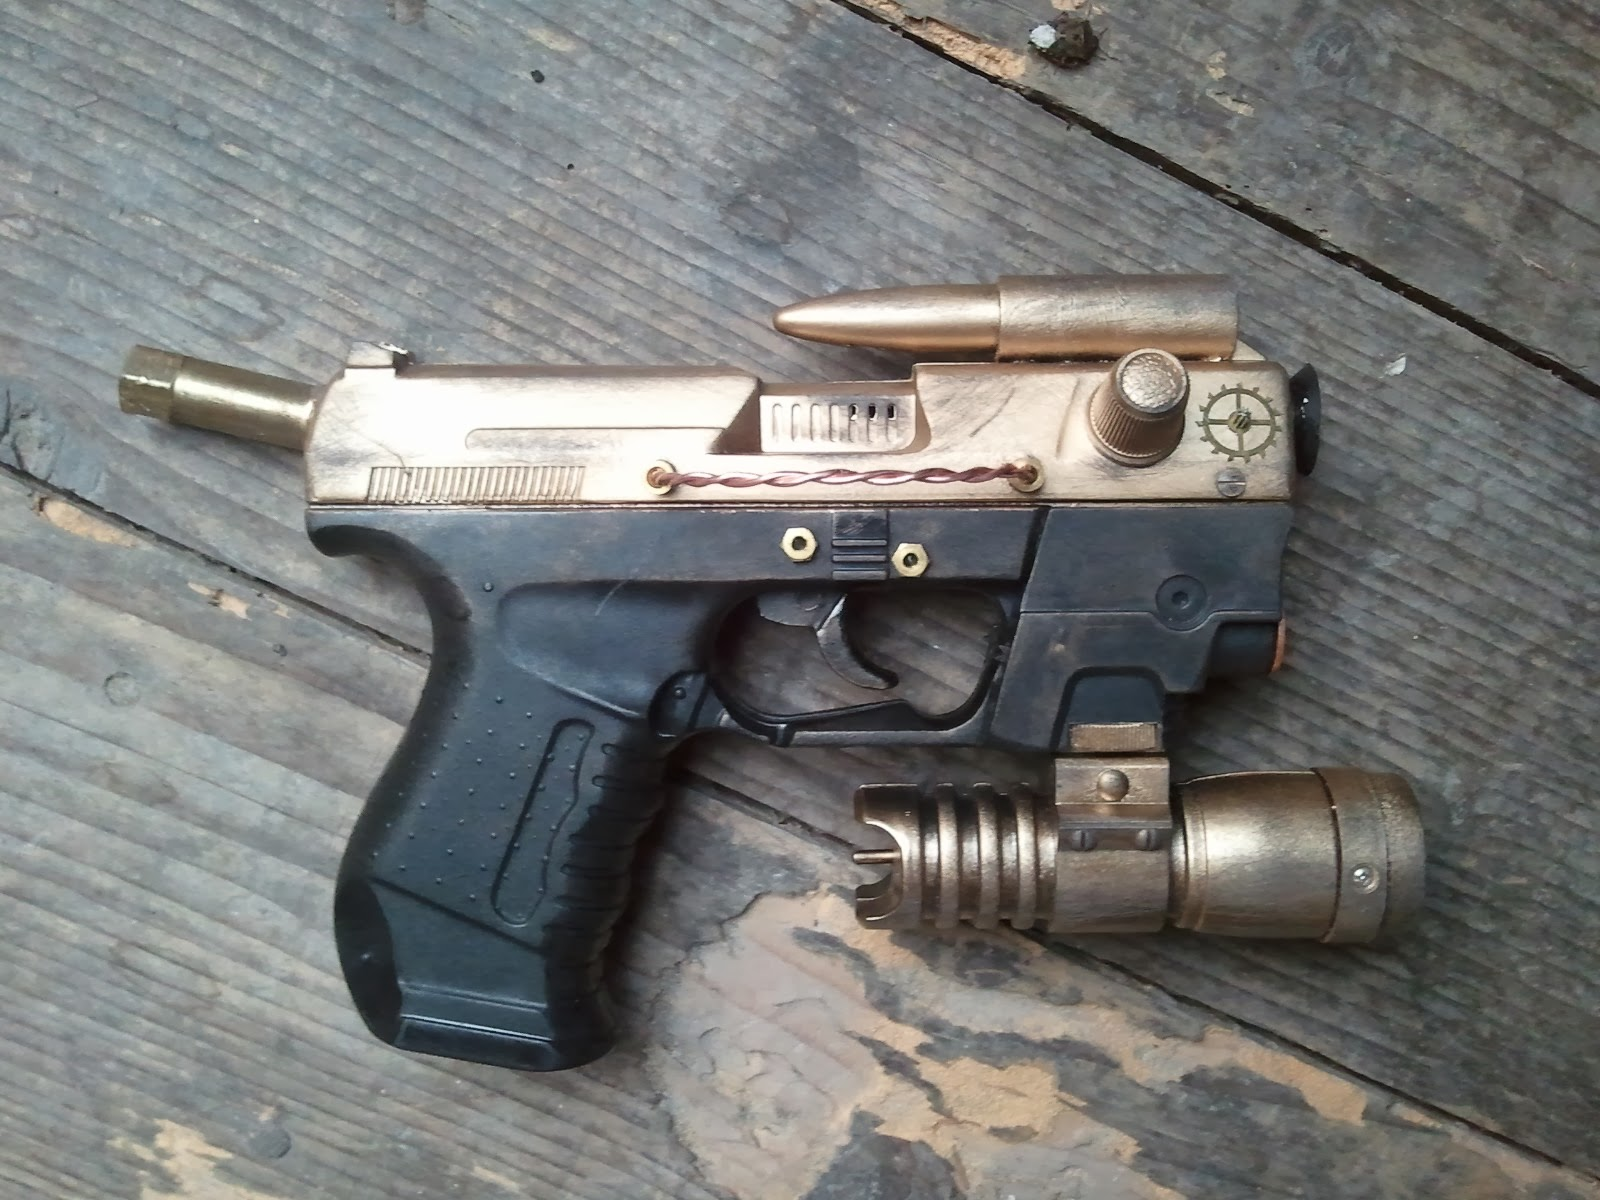 steampunkguns p 99 steampunk gun. Black Bedroom Furniture Sets. Home Design Ideas